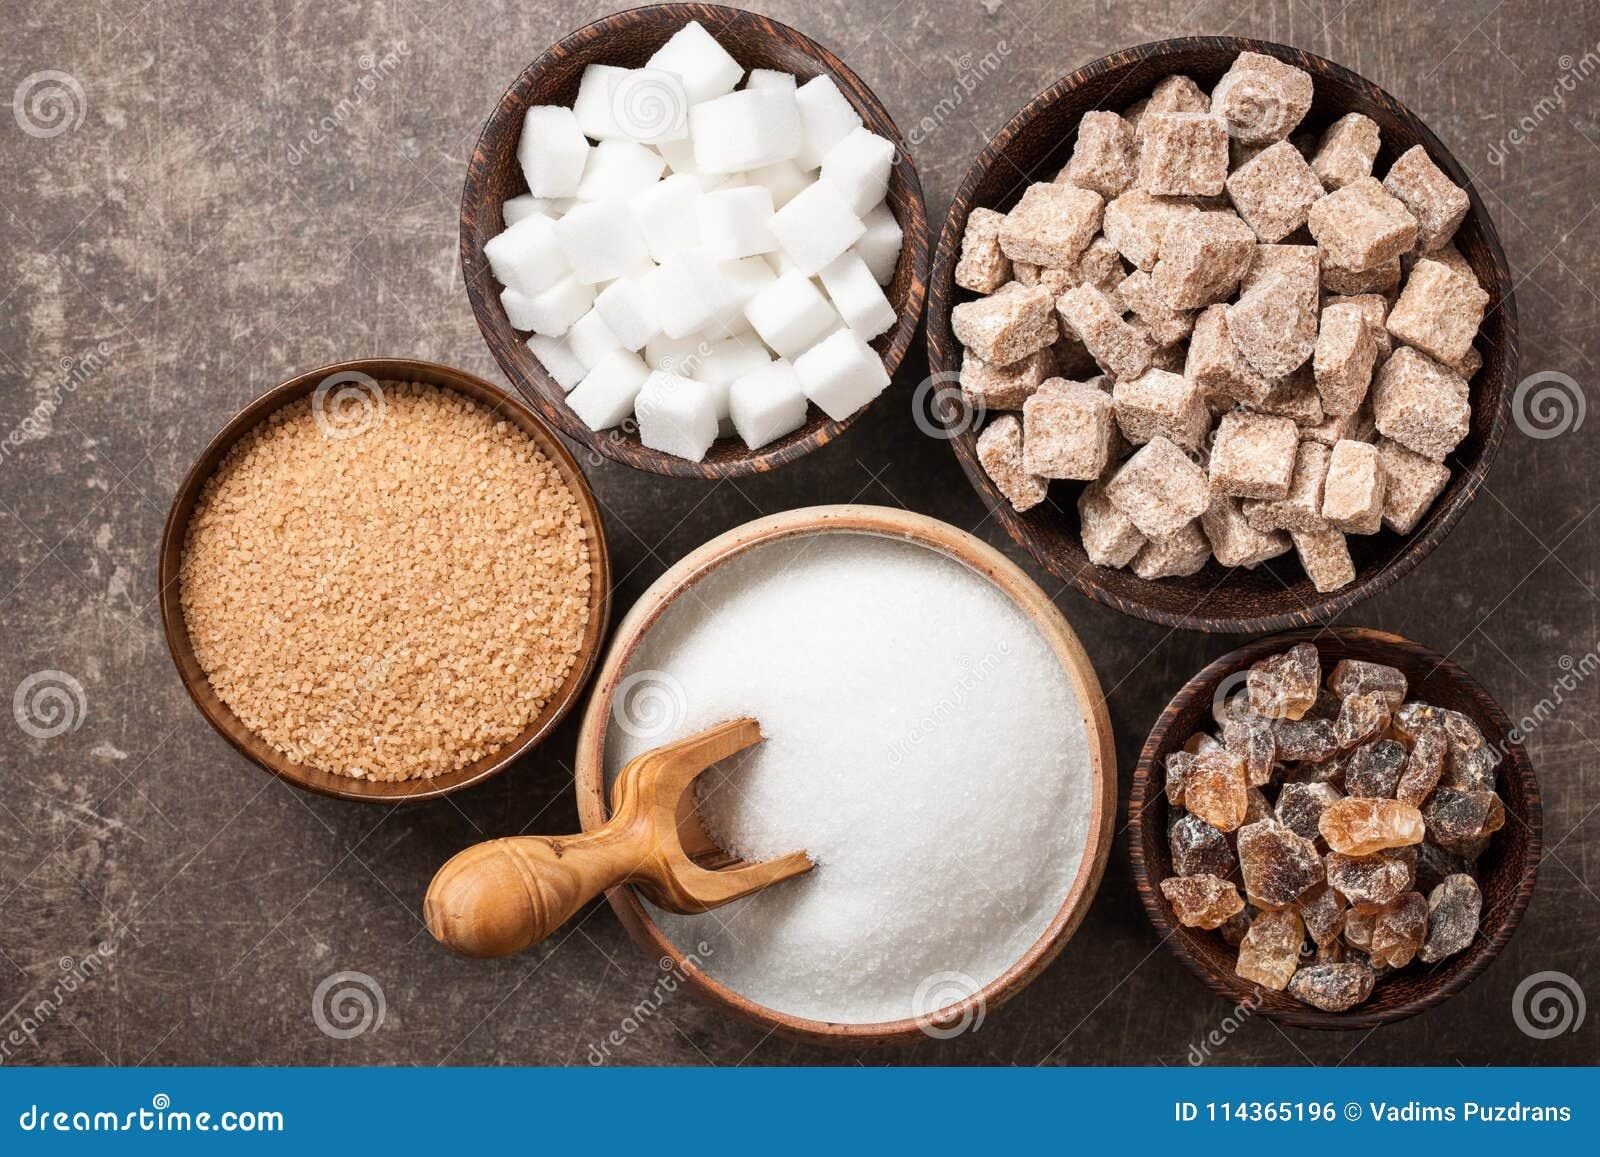 Różnorodny cukier w pucharach